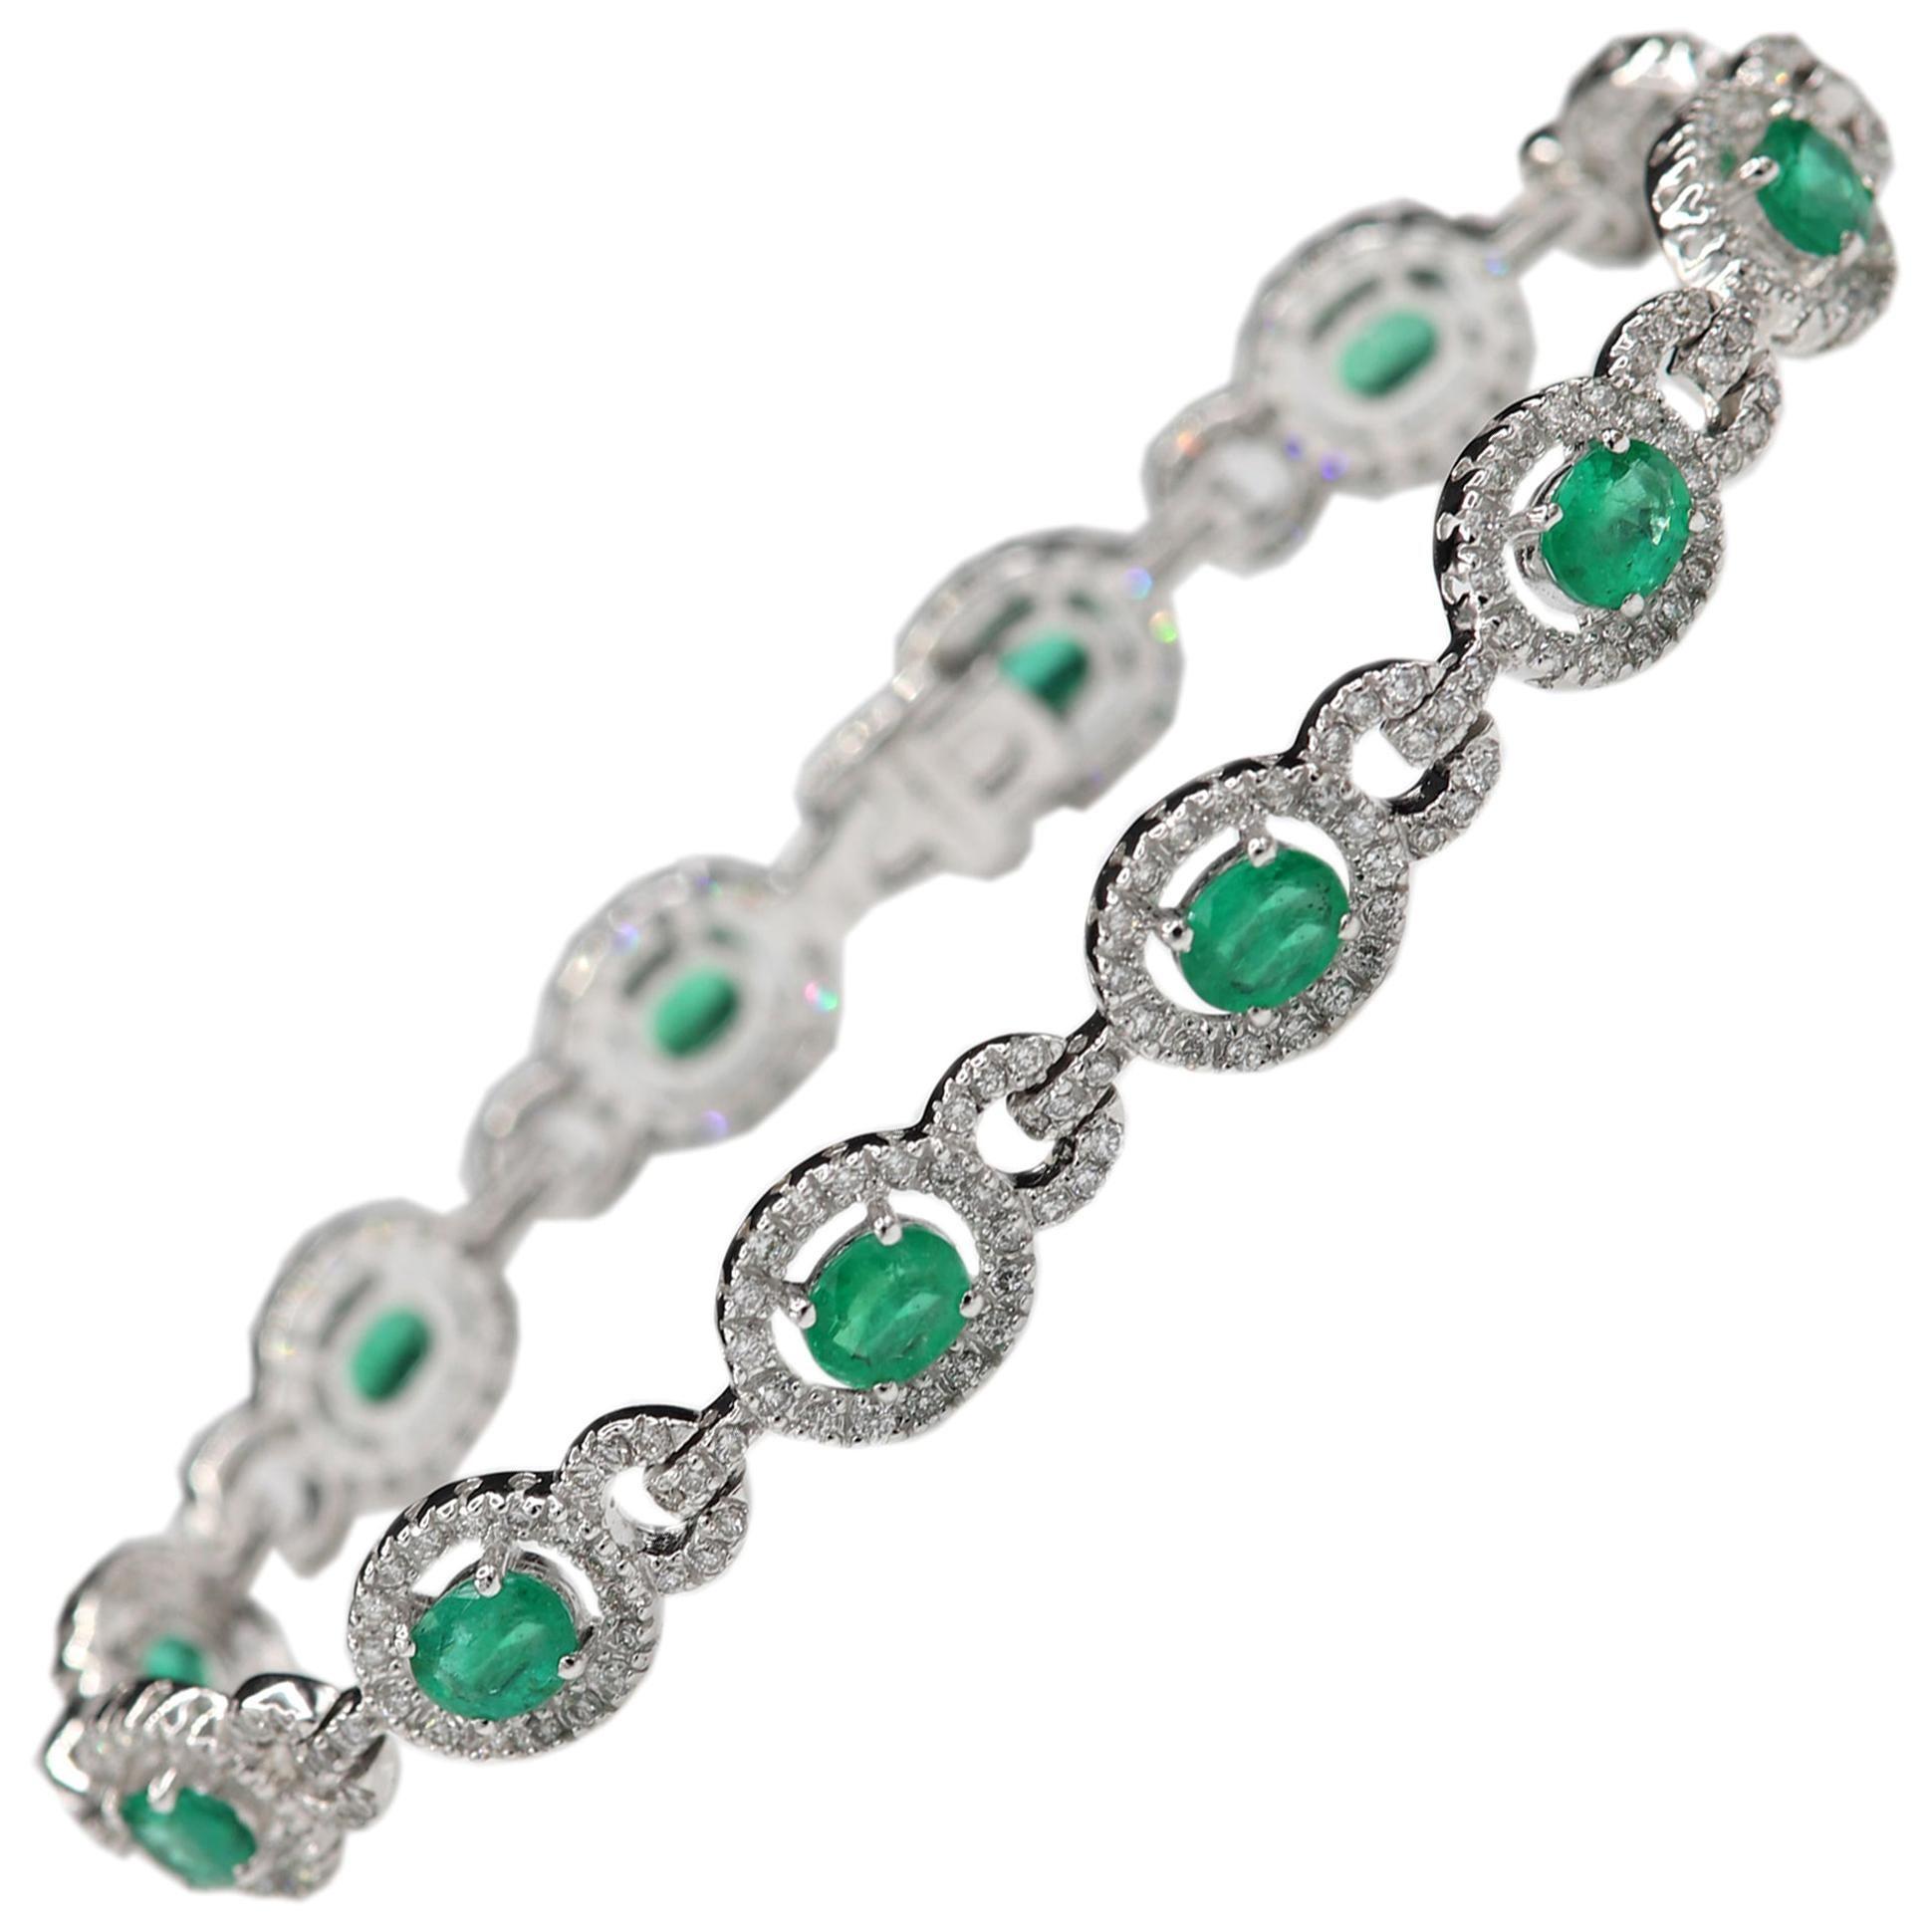 Natural Emerald Bracelet 18 Karat White Gold and Diamonds Oval Emerald